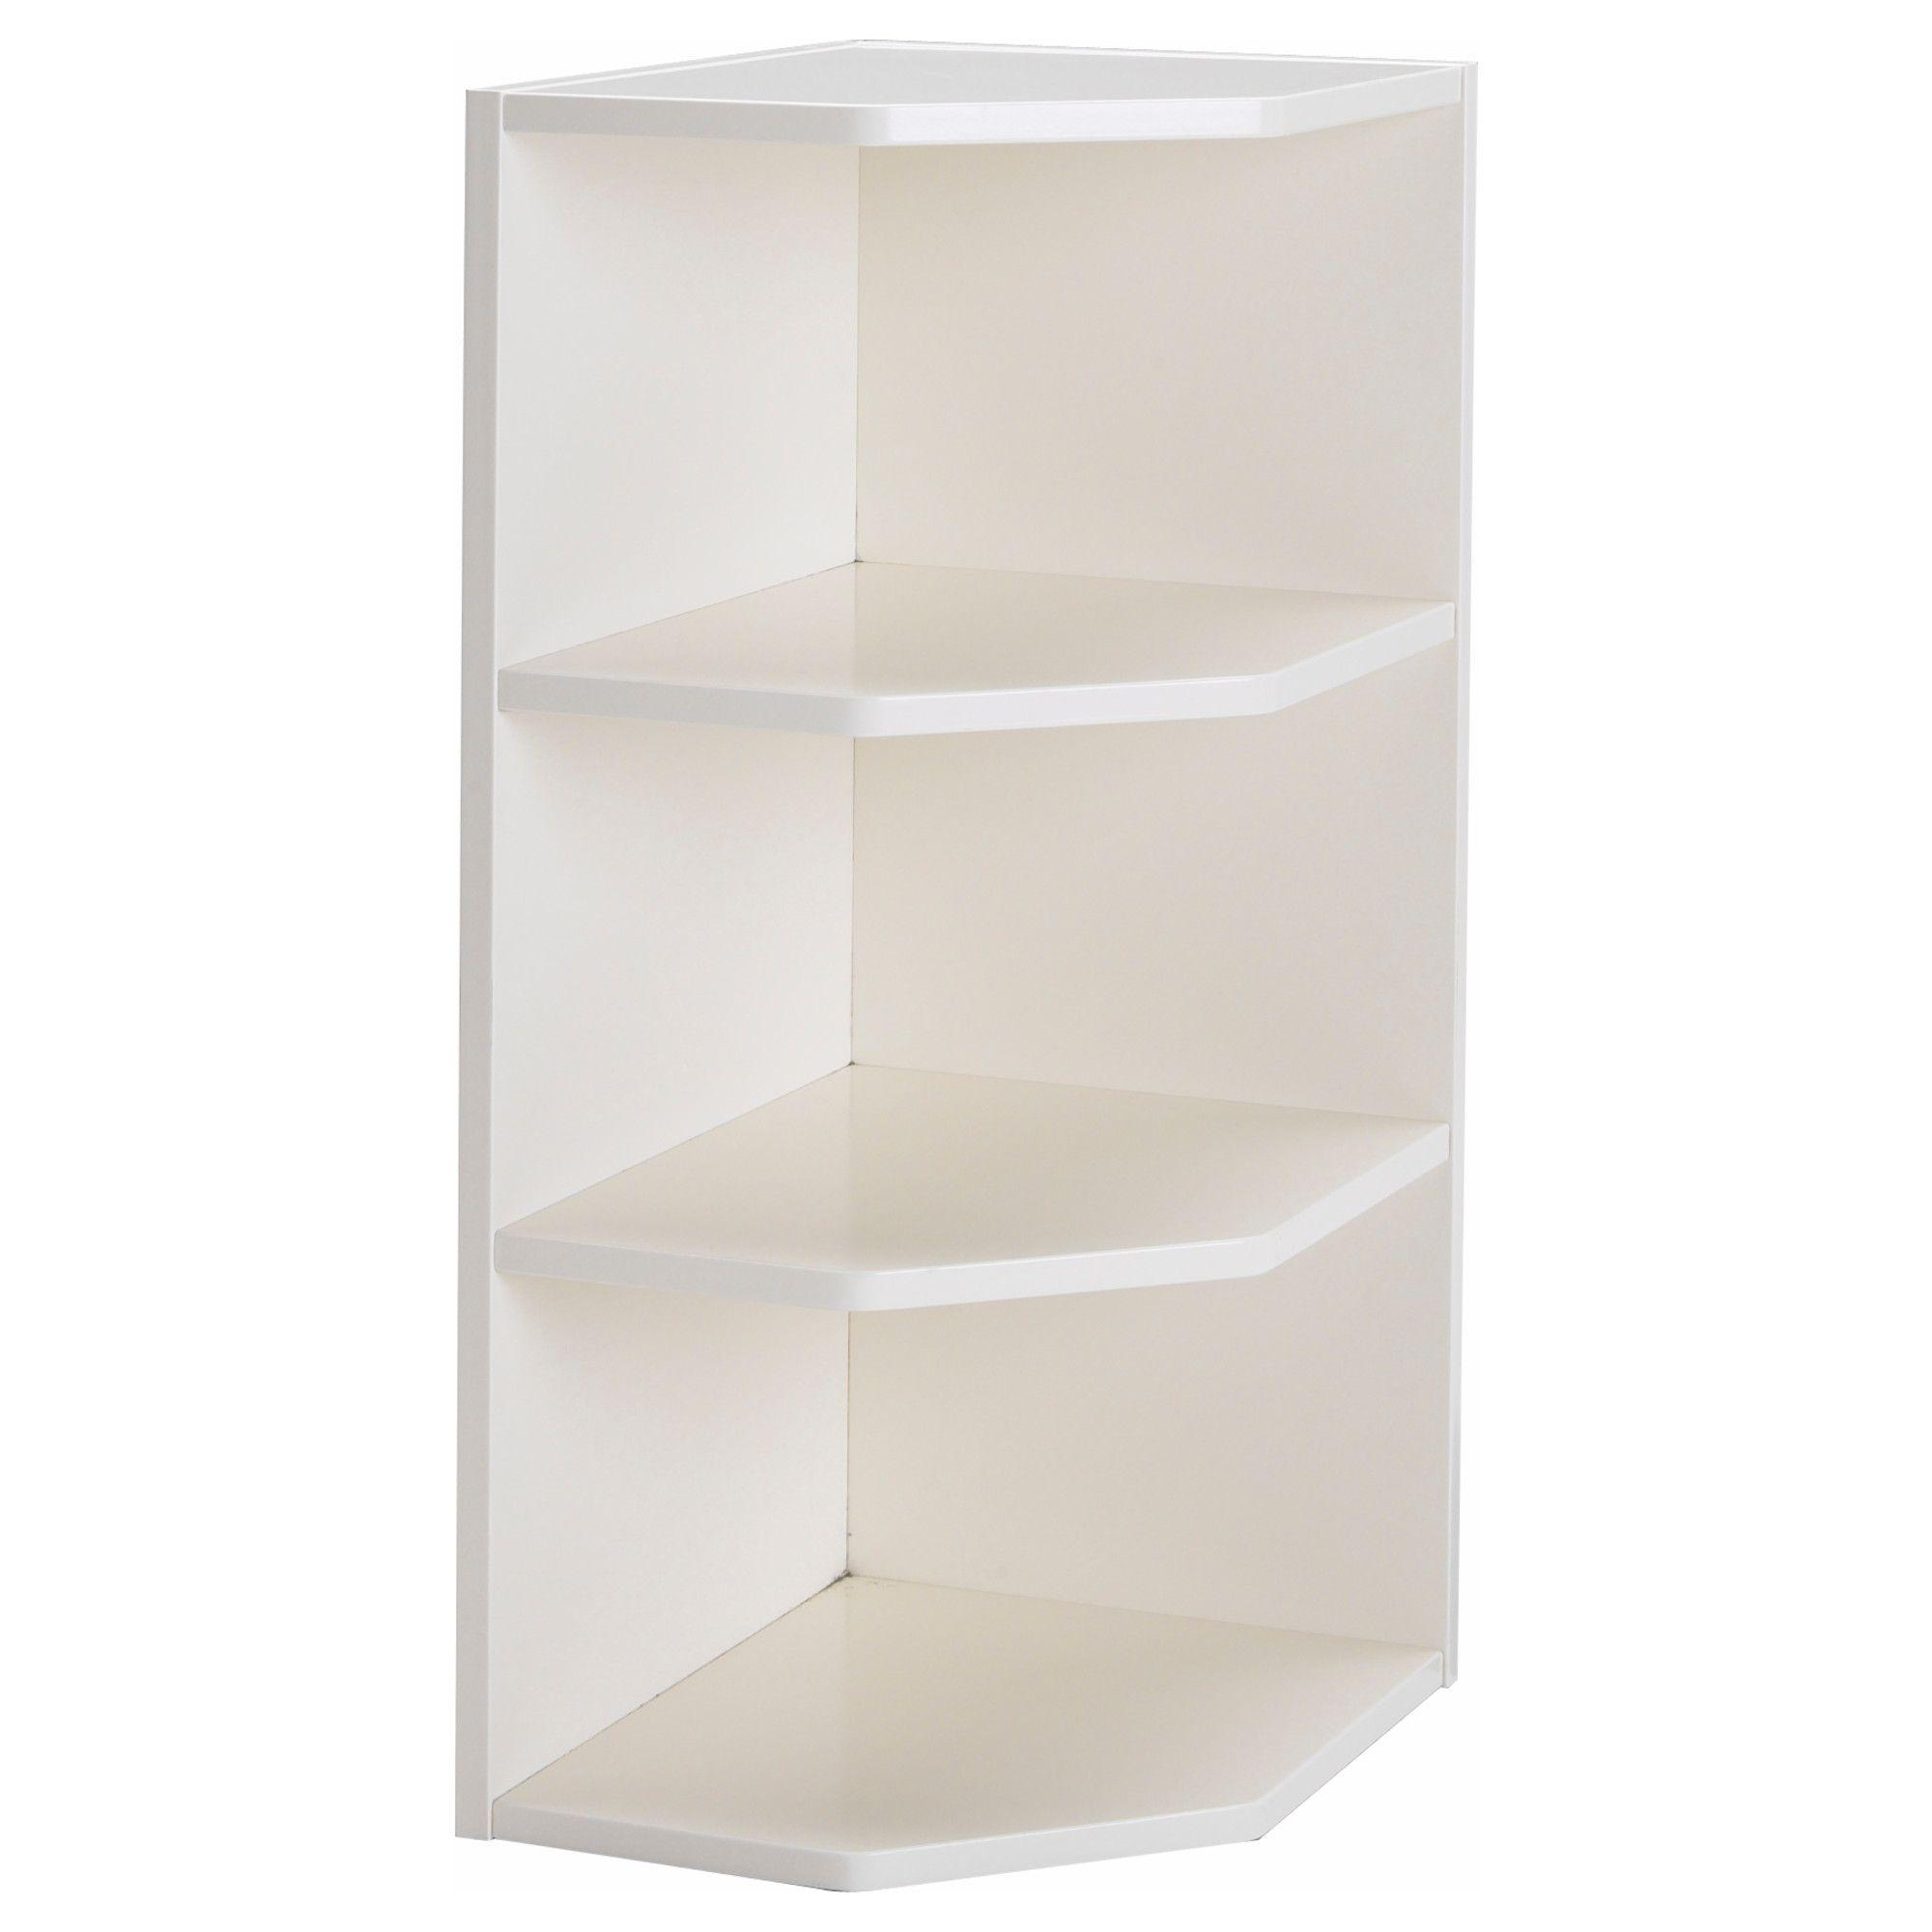 perfekt wall cabinet end unit 30x70 cm ikea little house